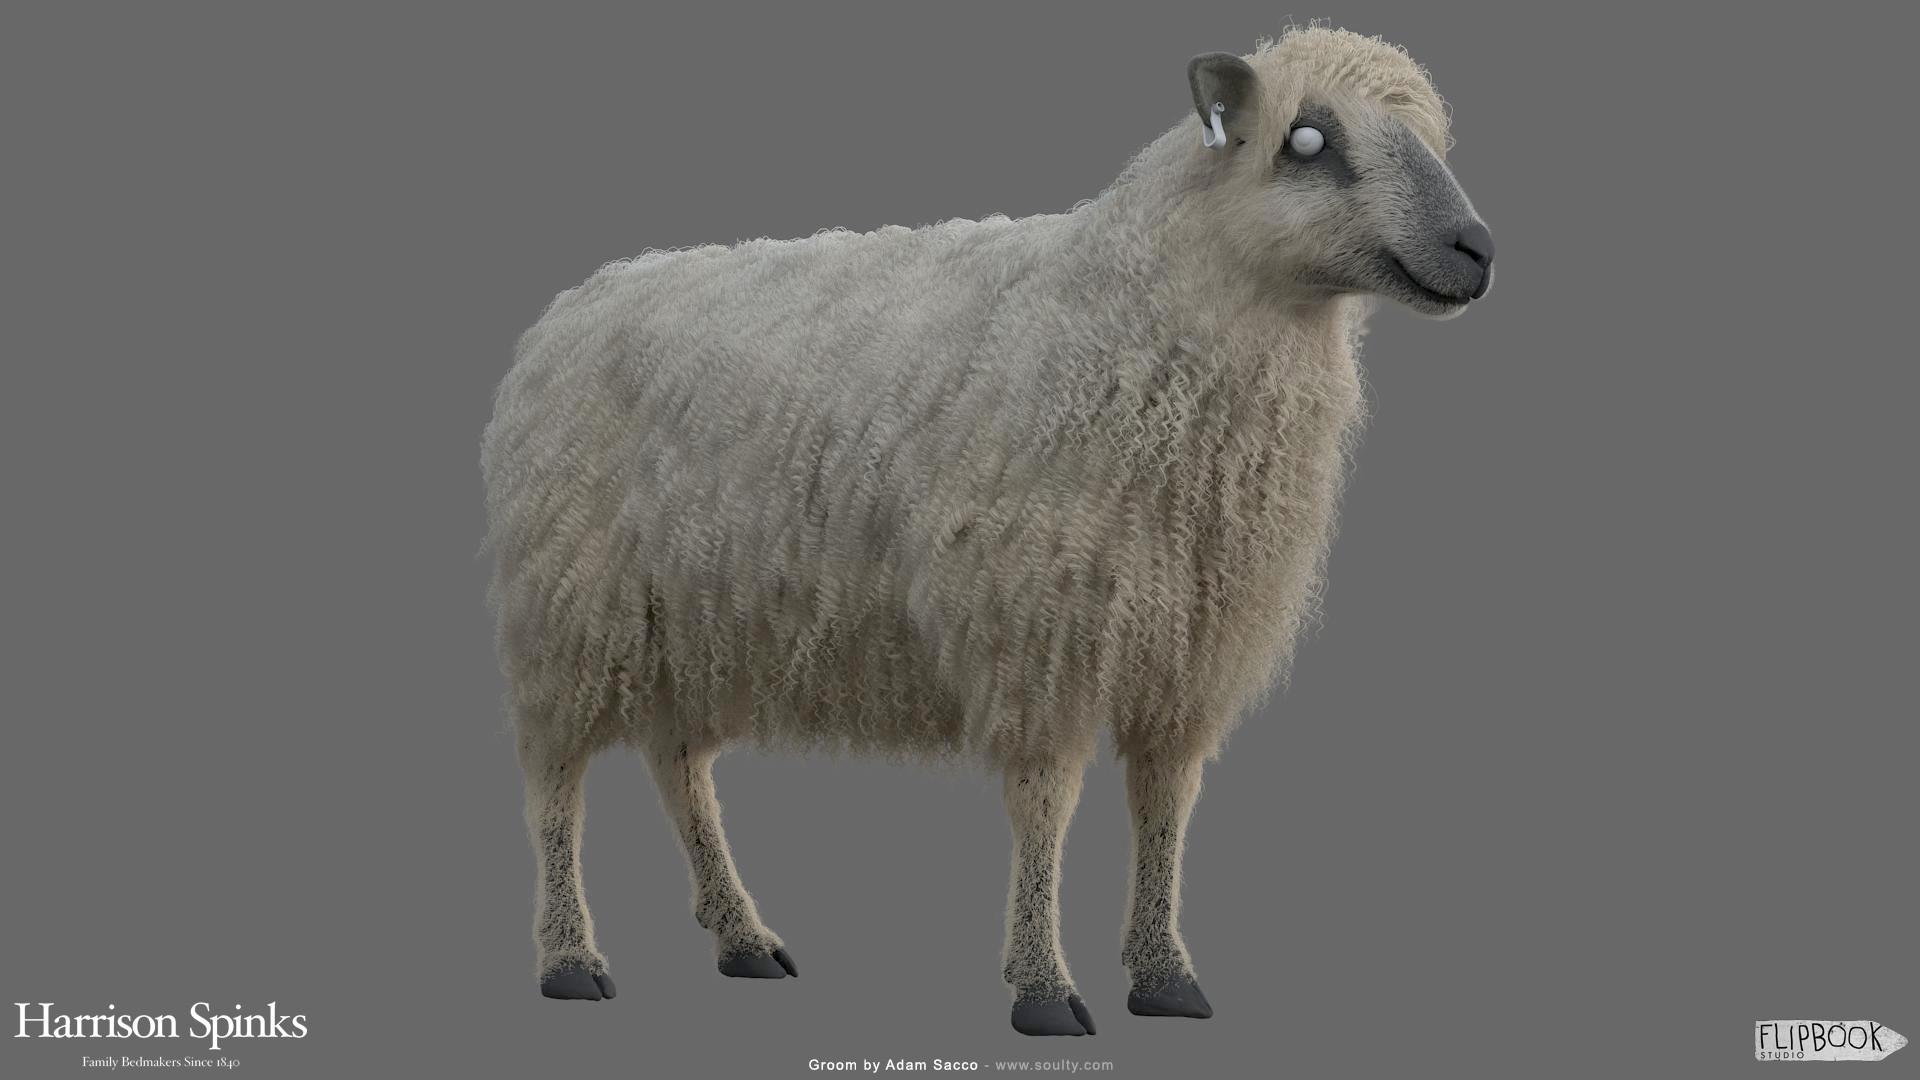 Adam sacco sheep groom 0002